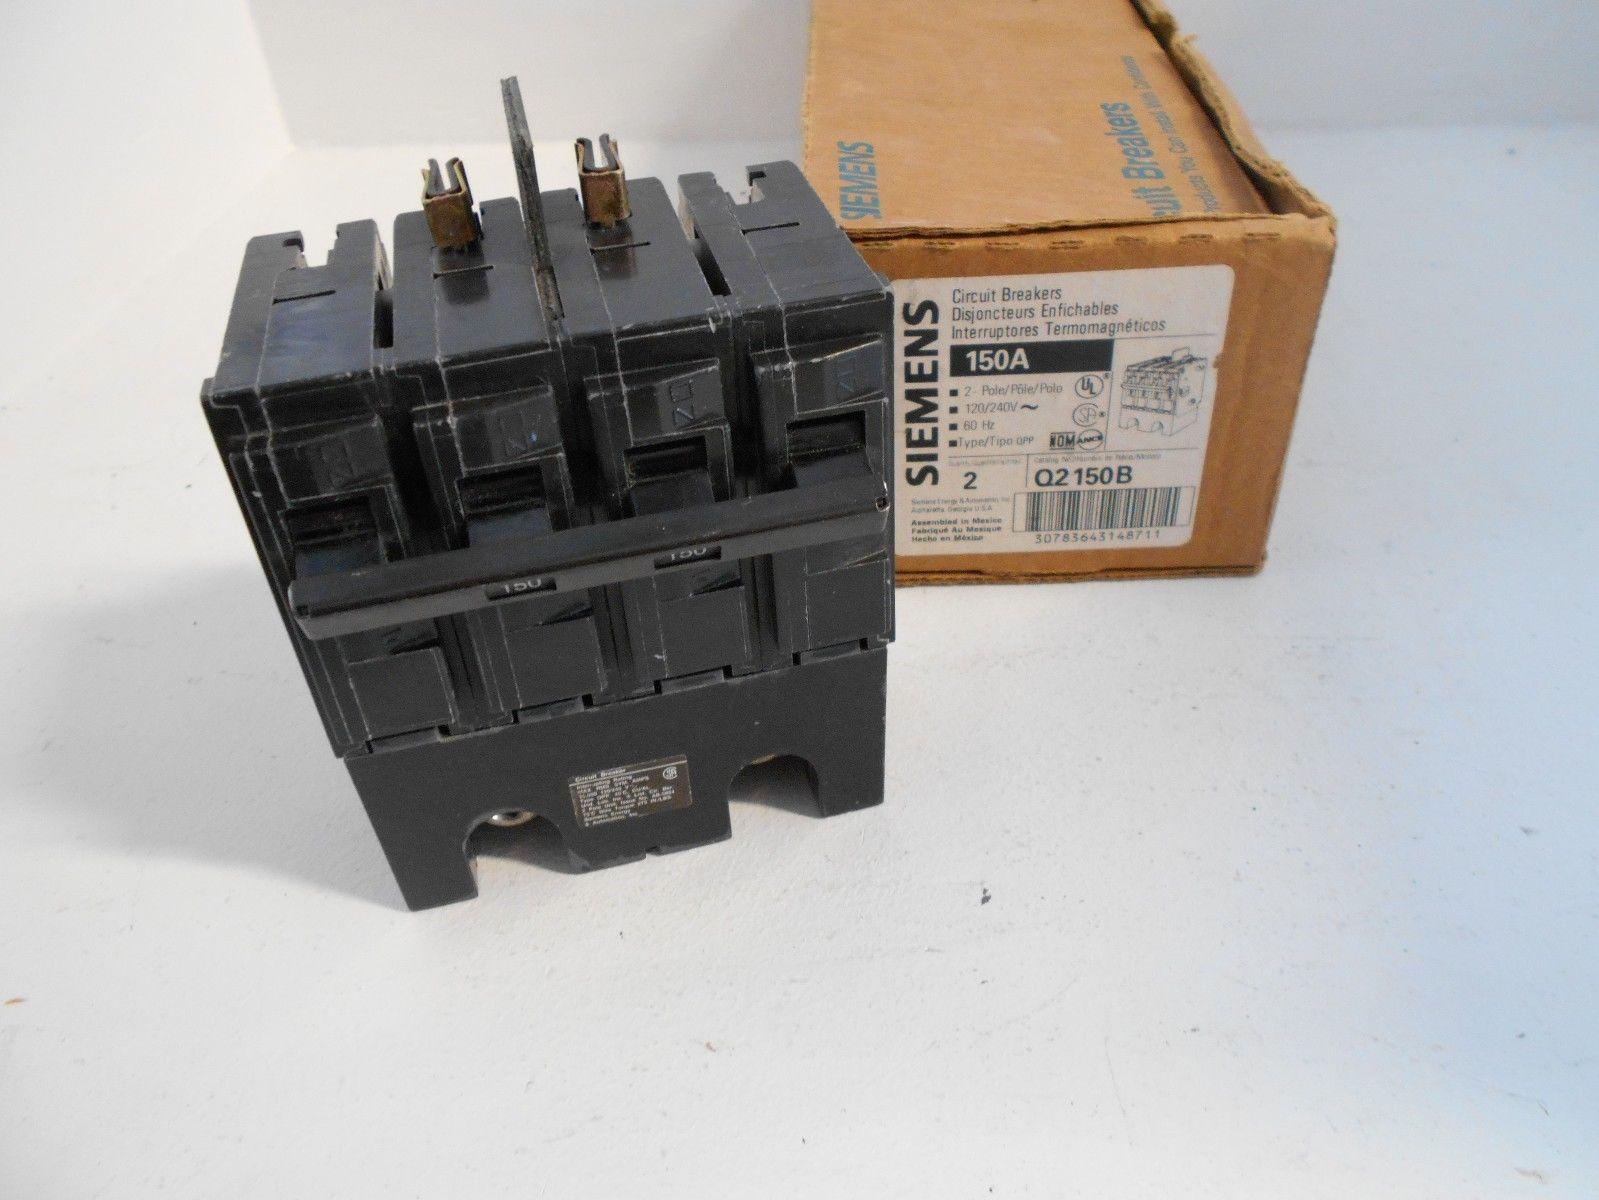 NEW IN BOX SIEMENS ITE Q2150B 150 AMP 2 POLE 240 V MAIN BREAKER PLUG ...